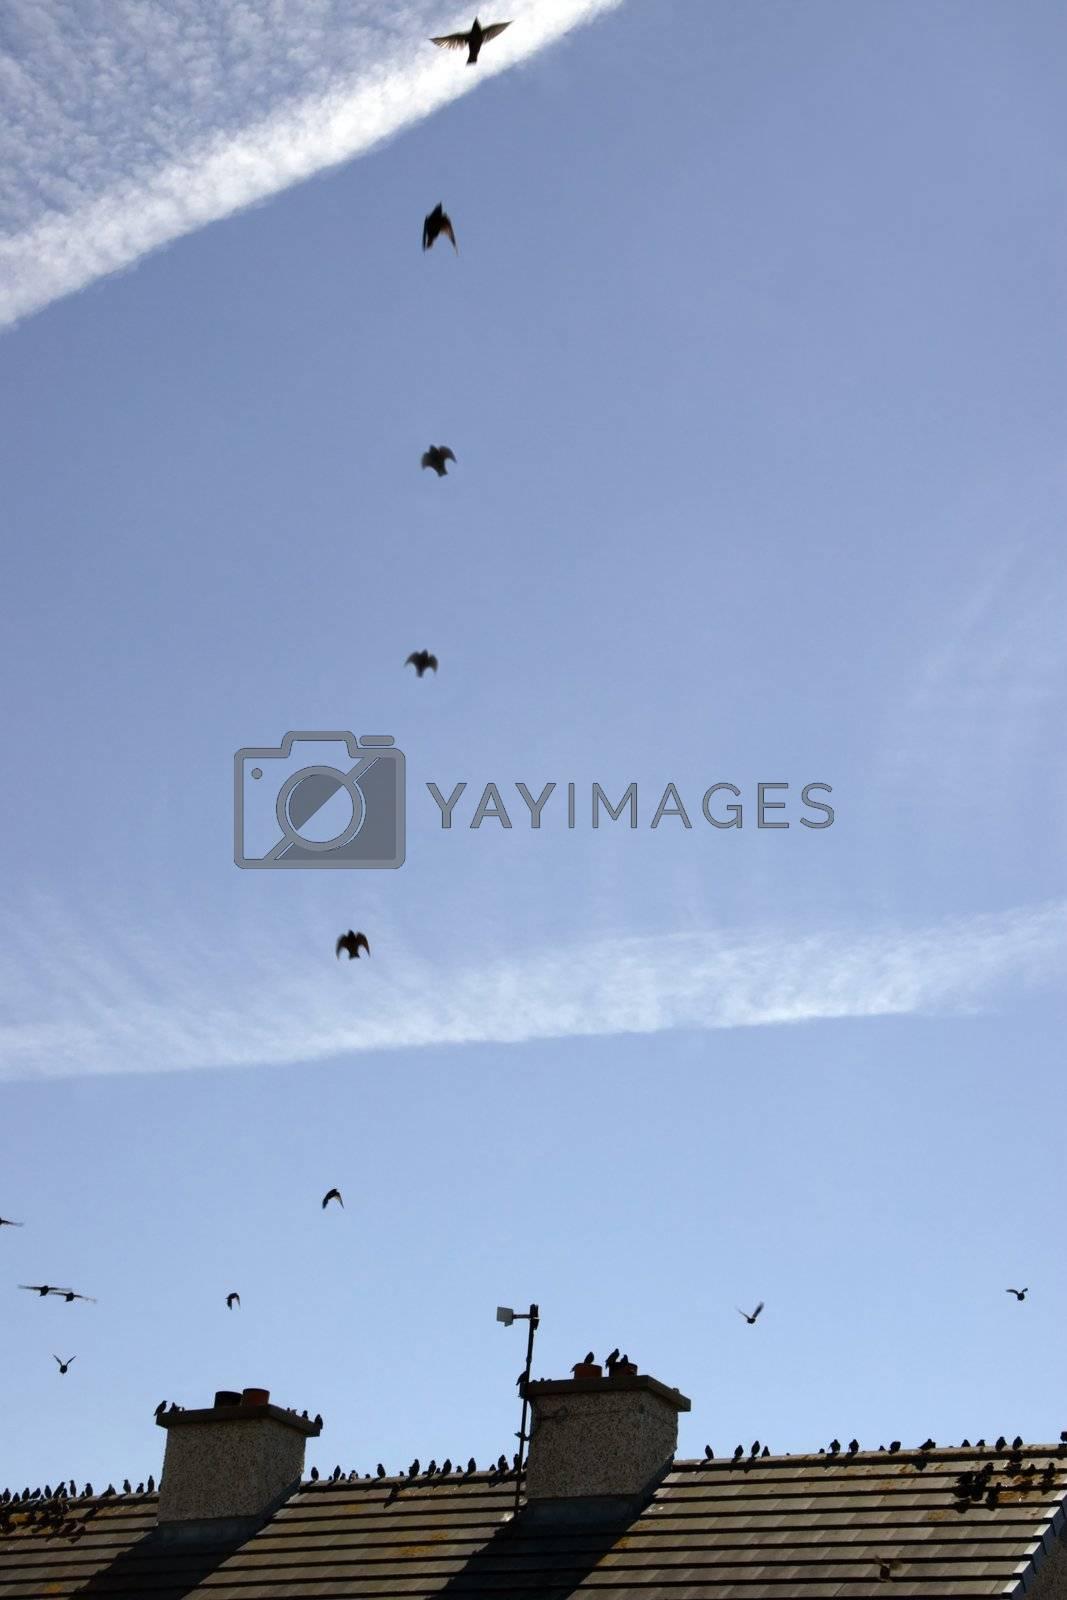 birds on a roof ii by morrbyte